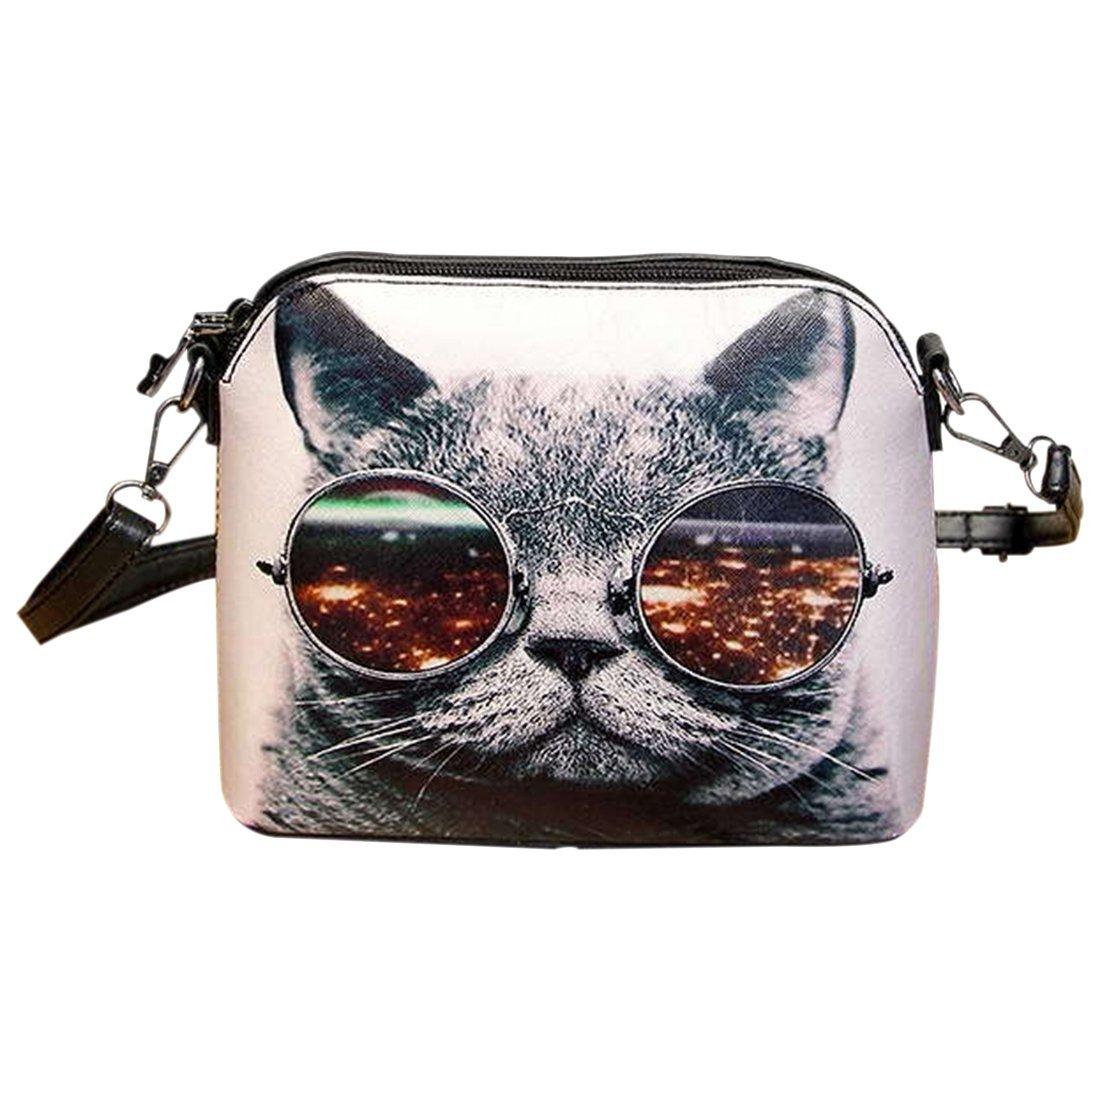 messenger bag - SODIAL(R)Printing women Handbag Shell bag women PU leather messenger bag women small bag £¨Cat£